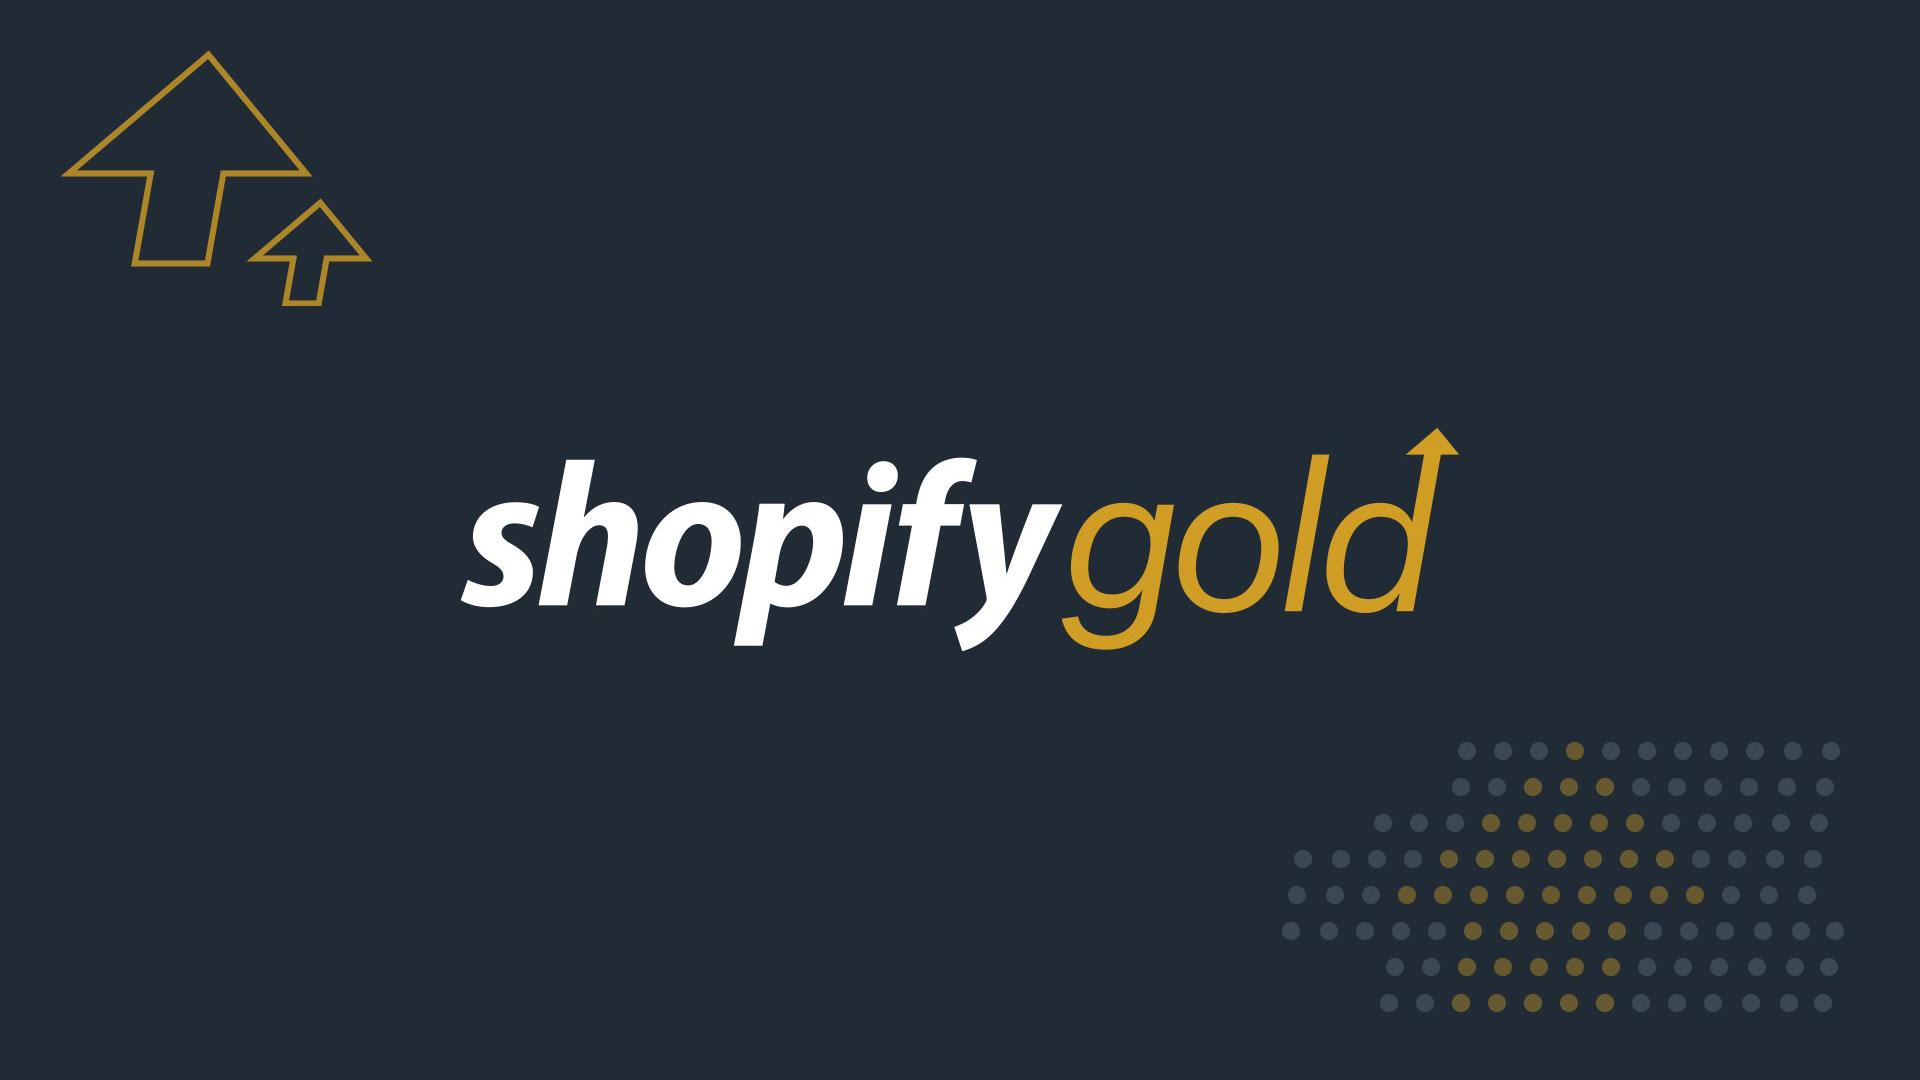 Shopify Gold